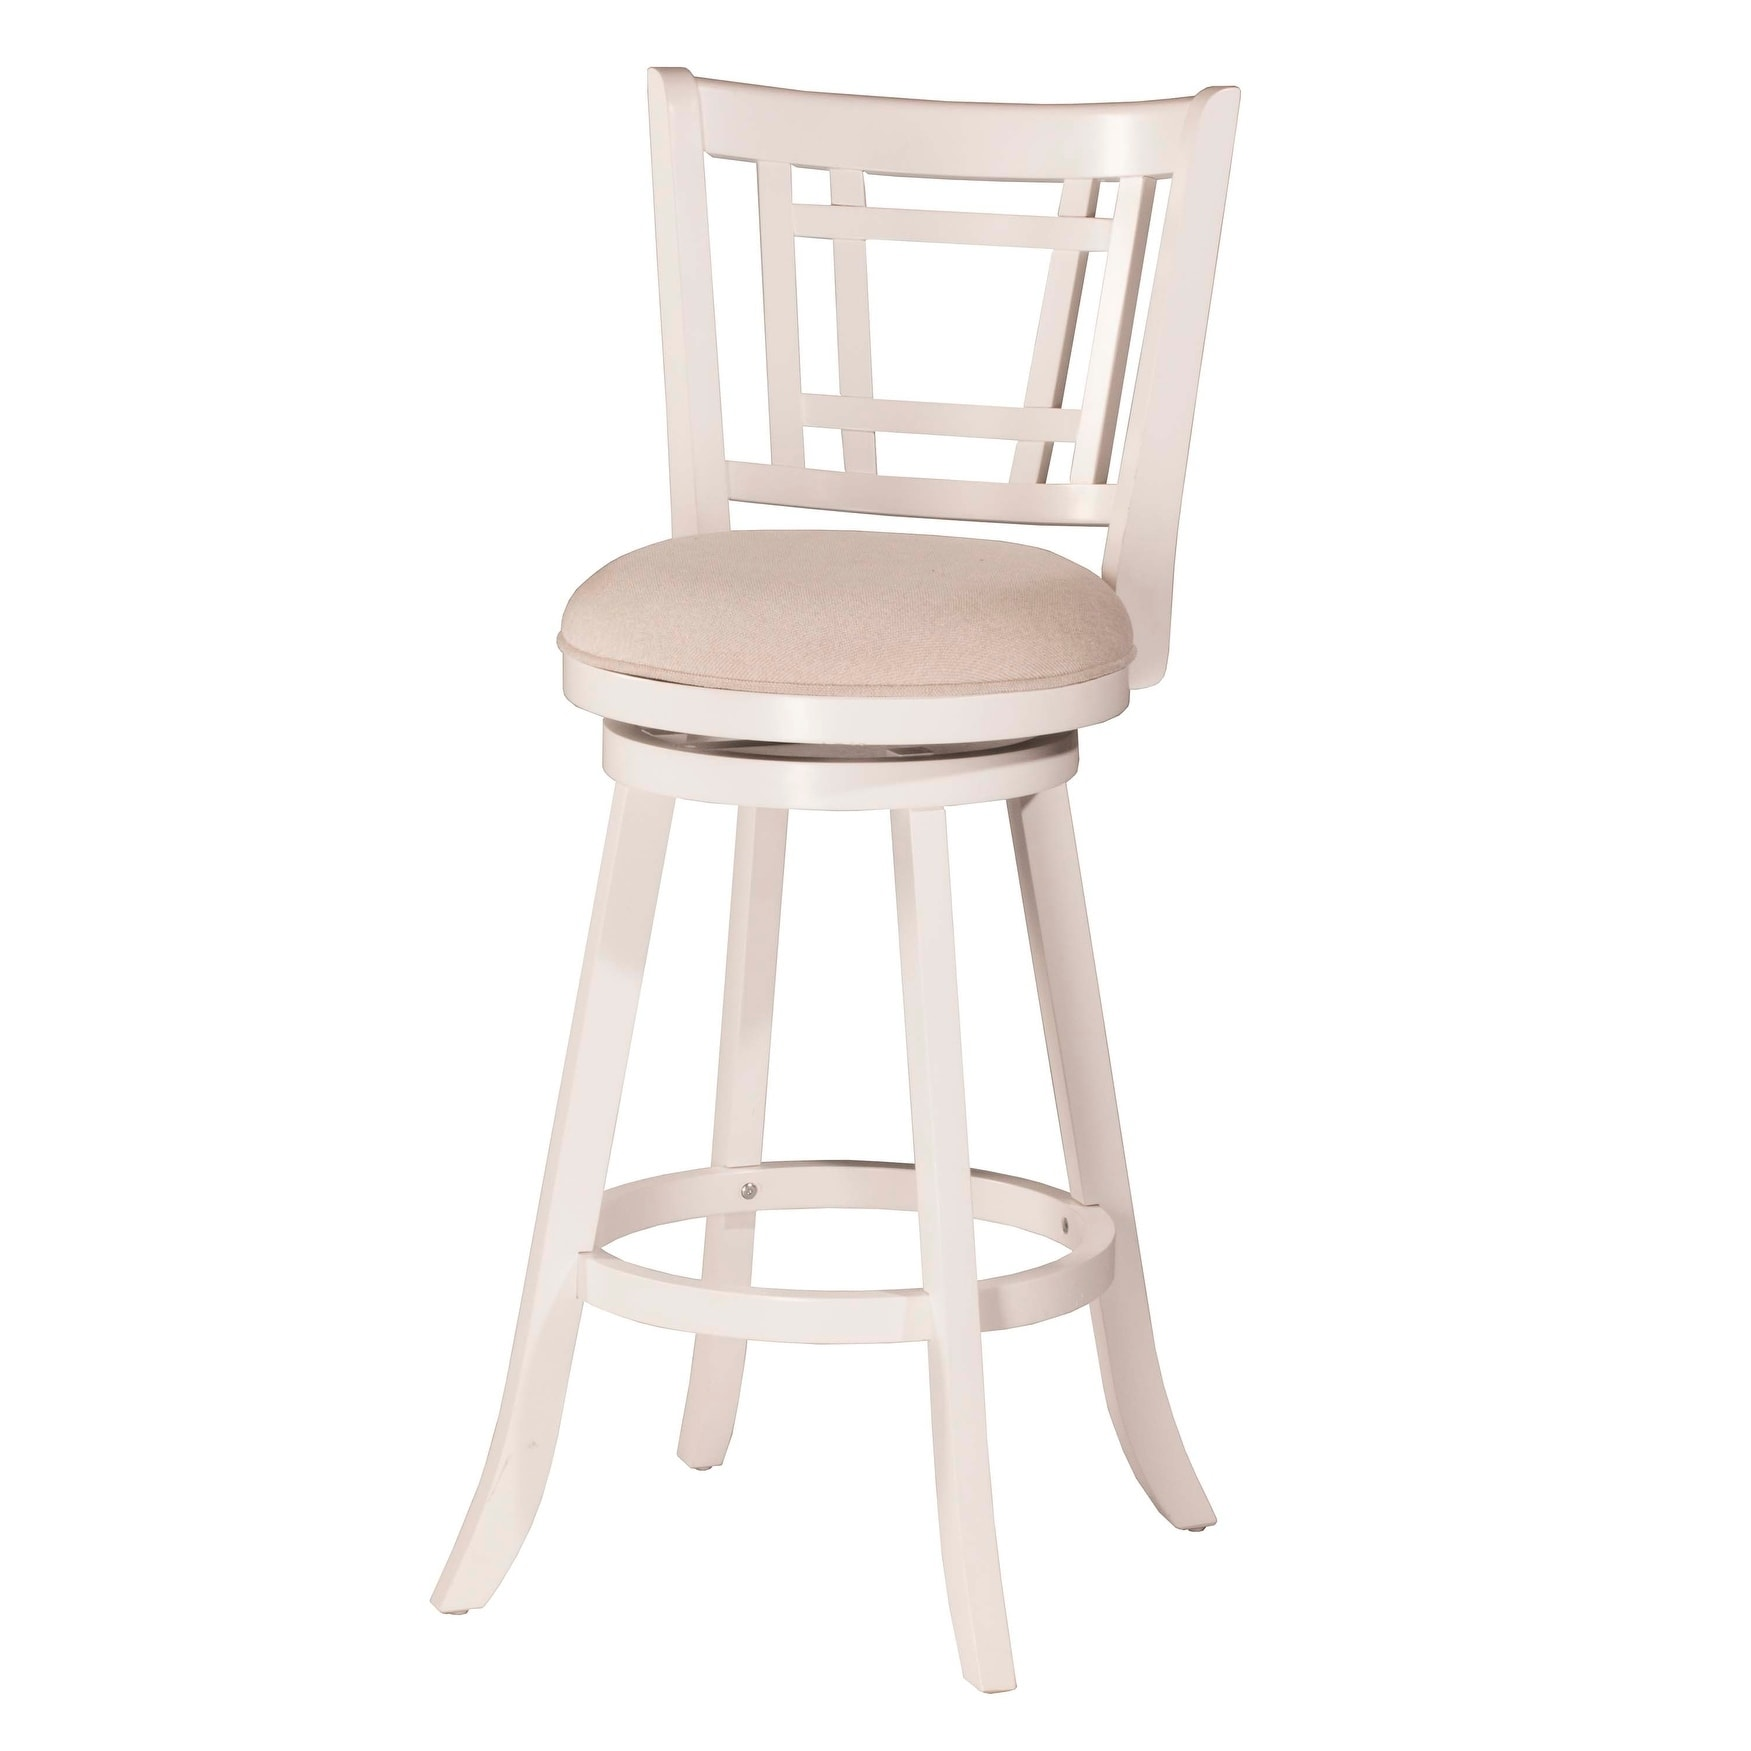 Swell Hillsdale Furniture Fairfox Swivel Counter Stool White 25 Creativecarmelina Interior Chair Design Creativecarmelinacom